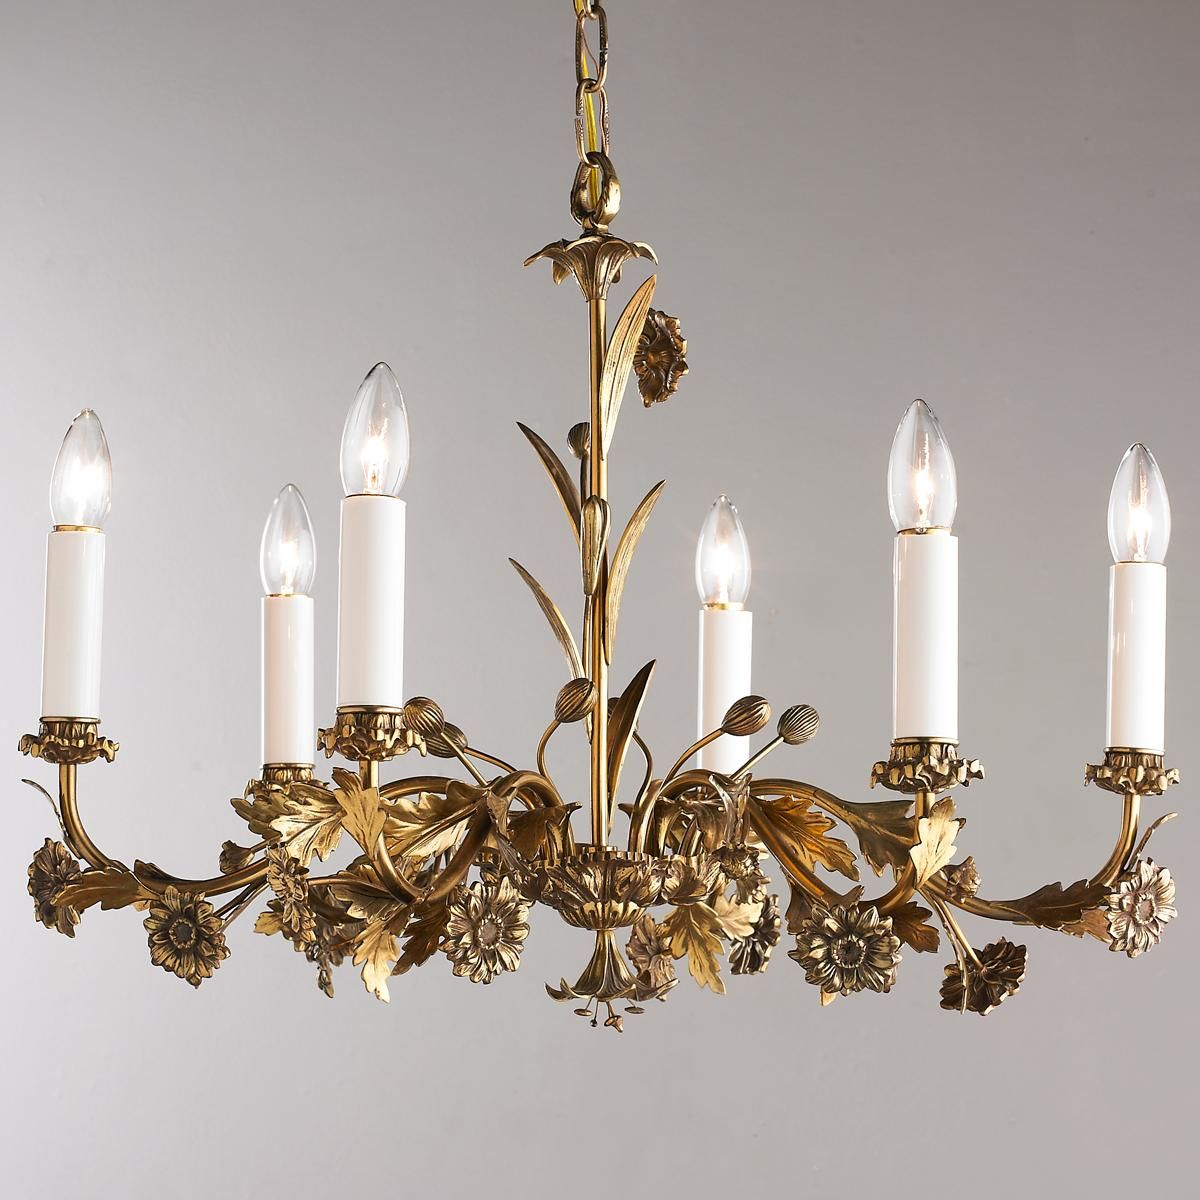 Antique lighting chandeliers antique furniture simple antique brass chandeliers remarkable chandelier remodel ideas with antique brass chandeliers antique 6 arm aloadofball Images